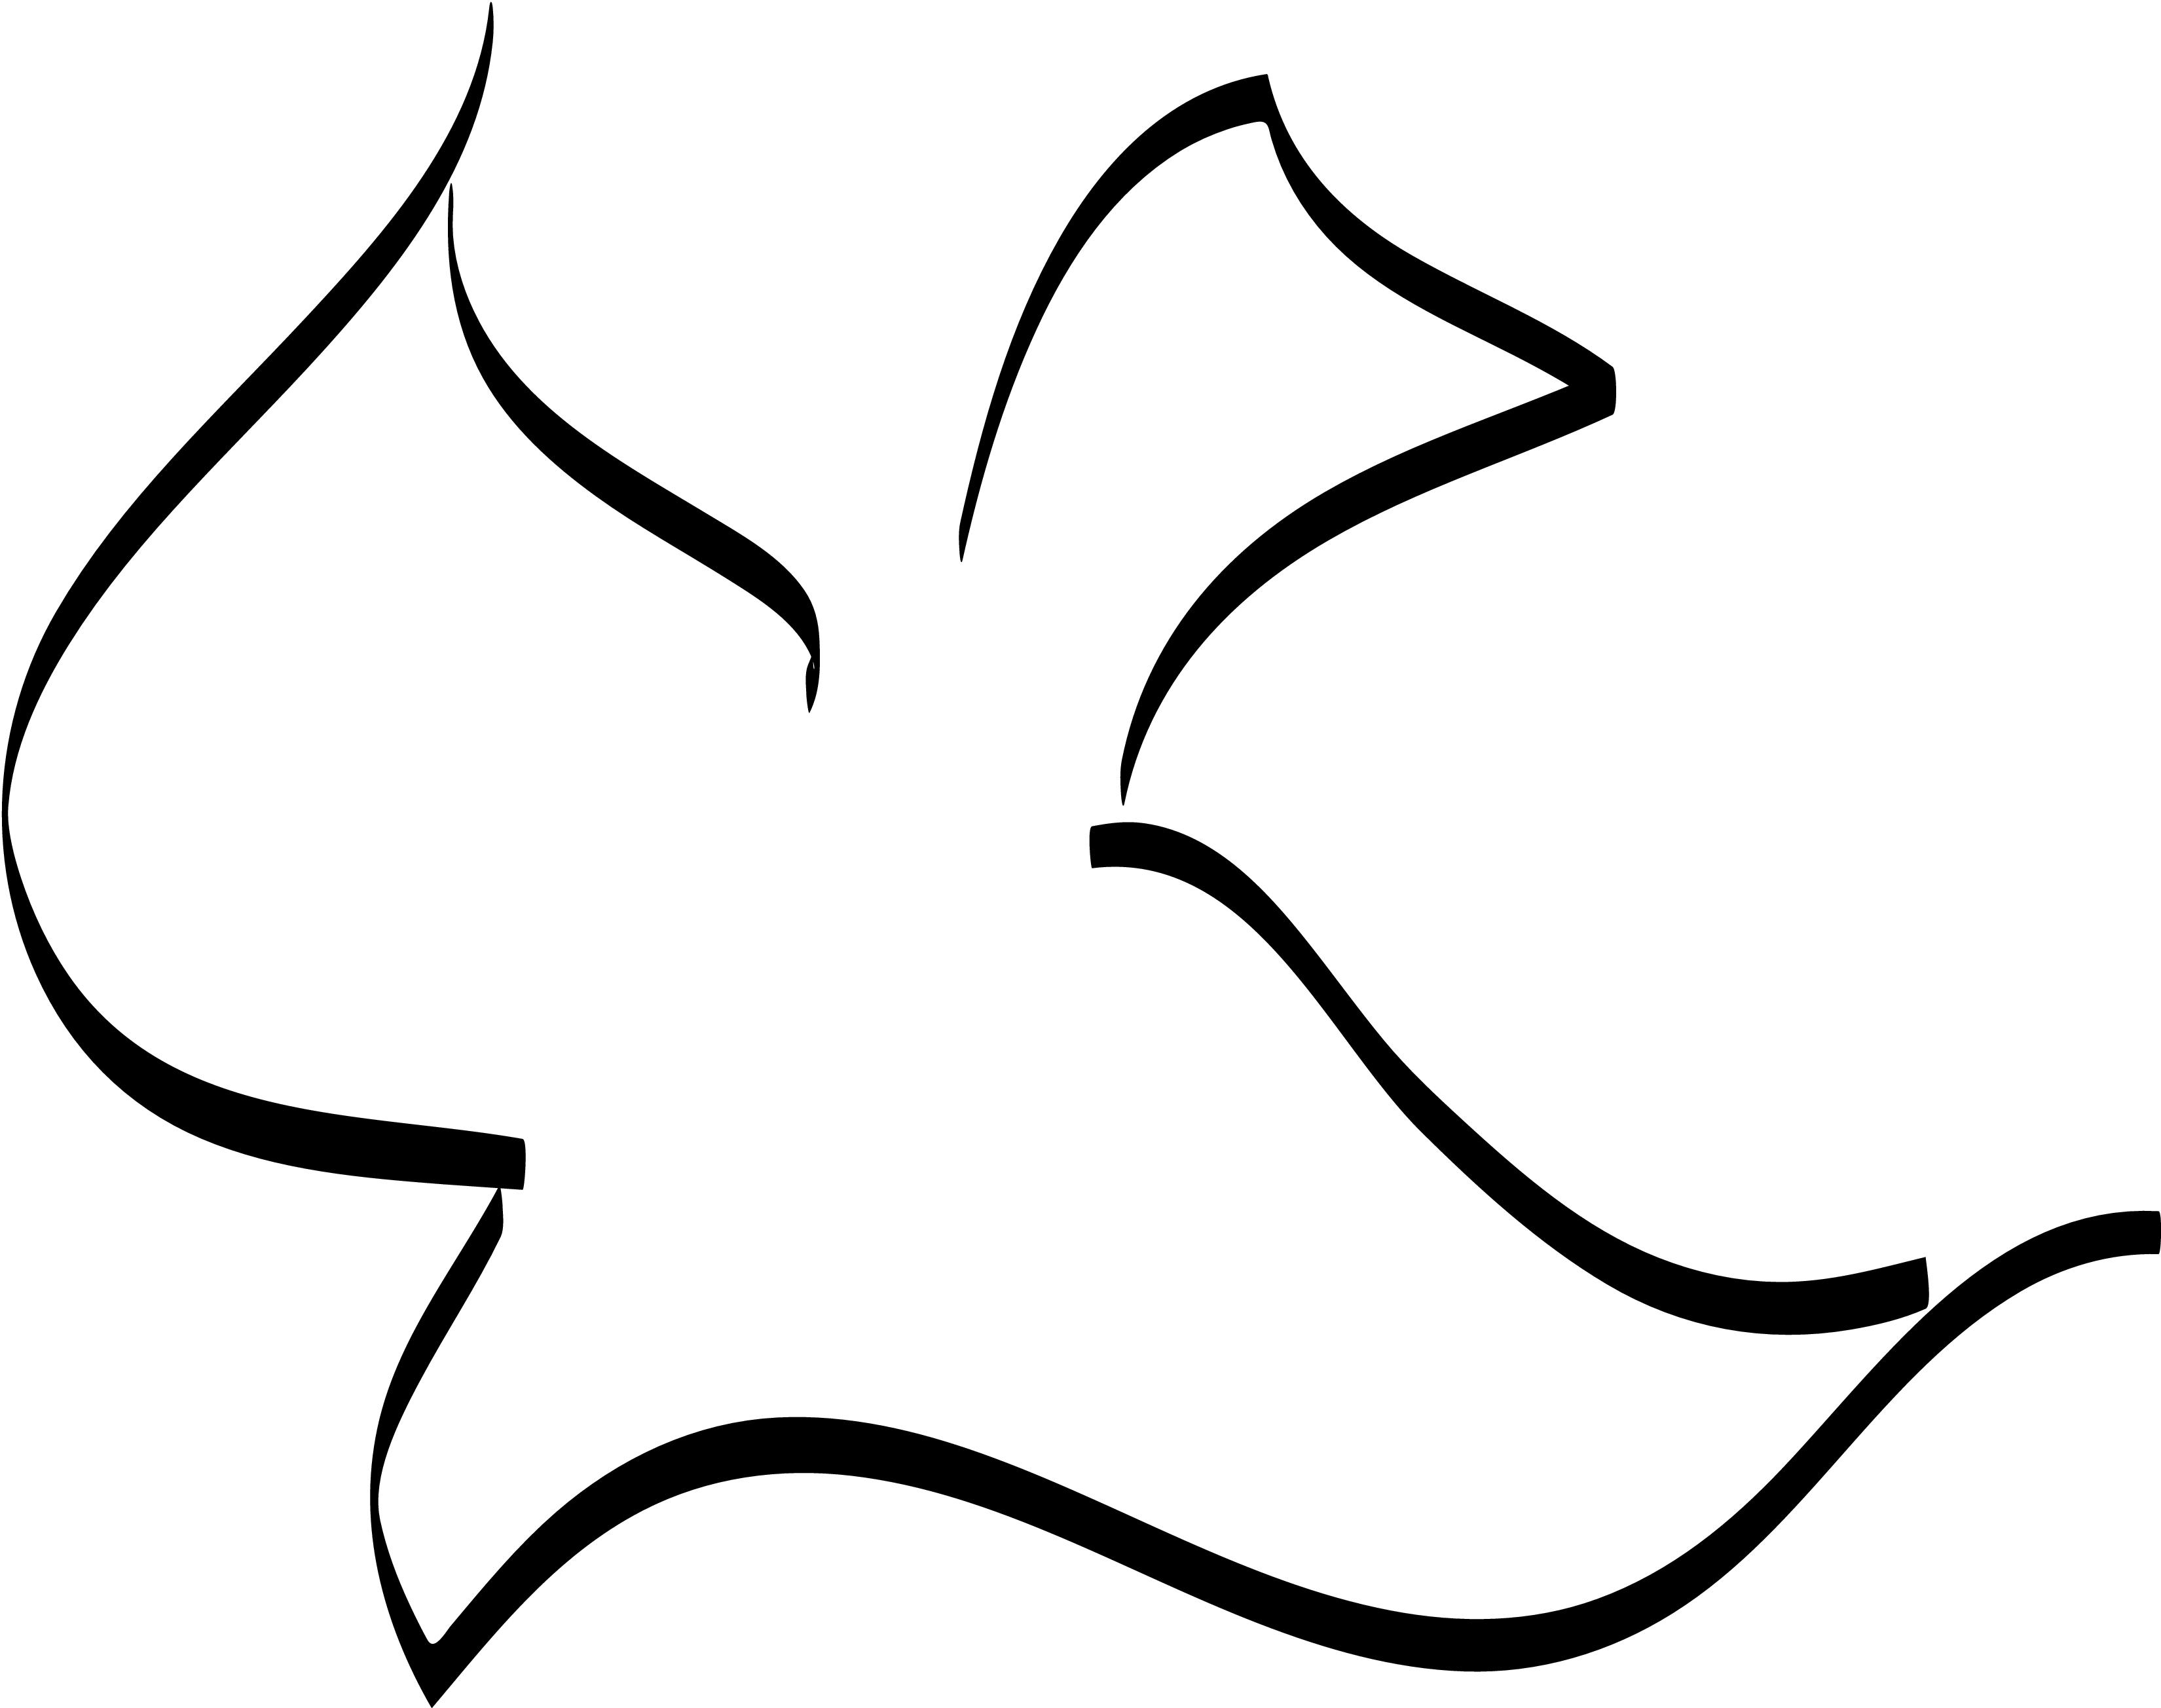 Holy Spirit Dove Clipart Clipart Panda F-Holy Spirit Dove Clipart Clipart Panda Free Clipart Images-16